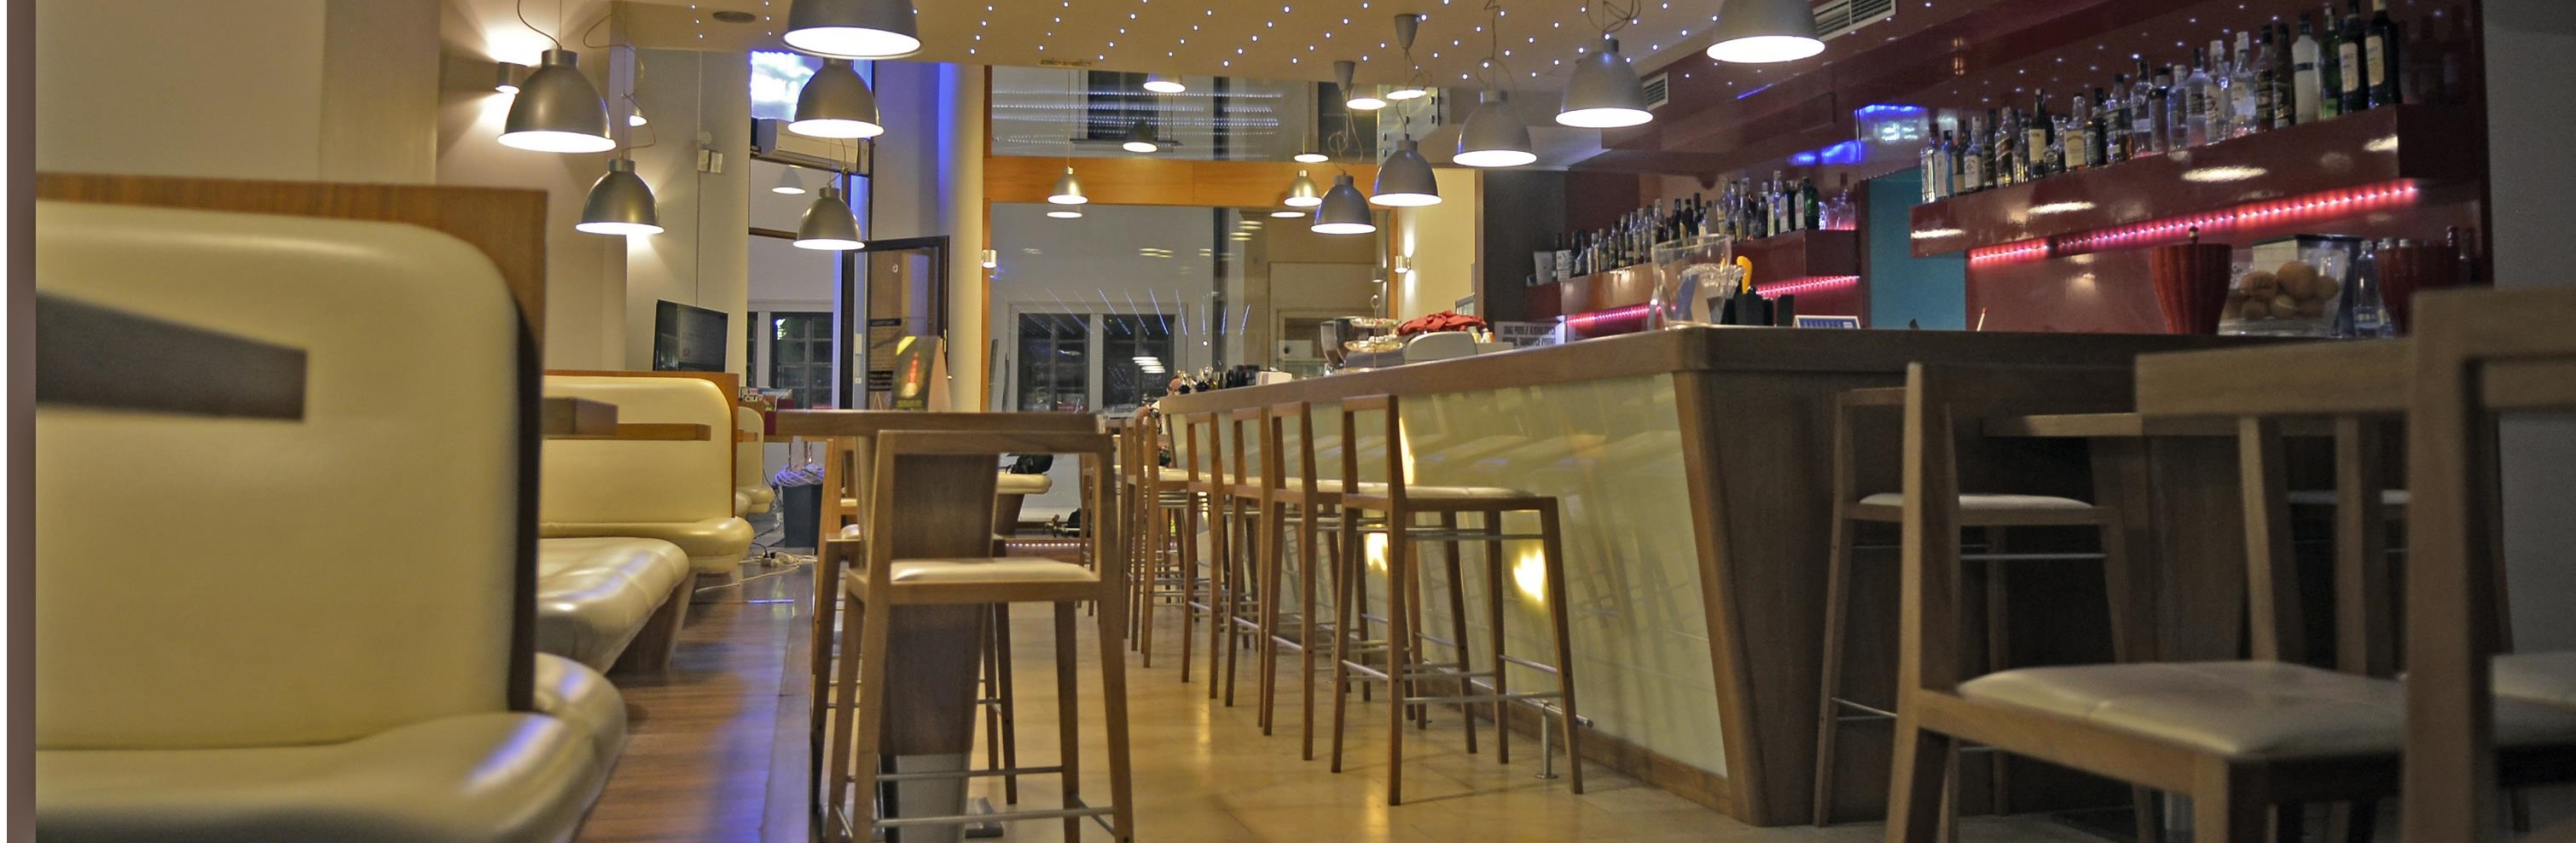 Liberty Cafe - Brno